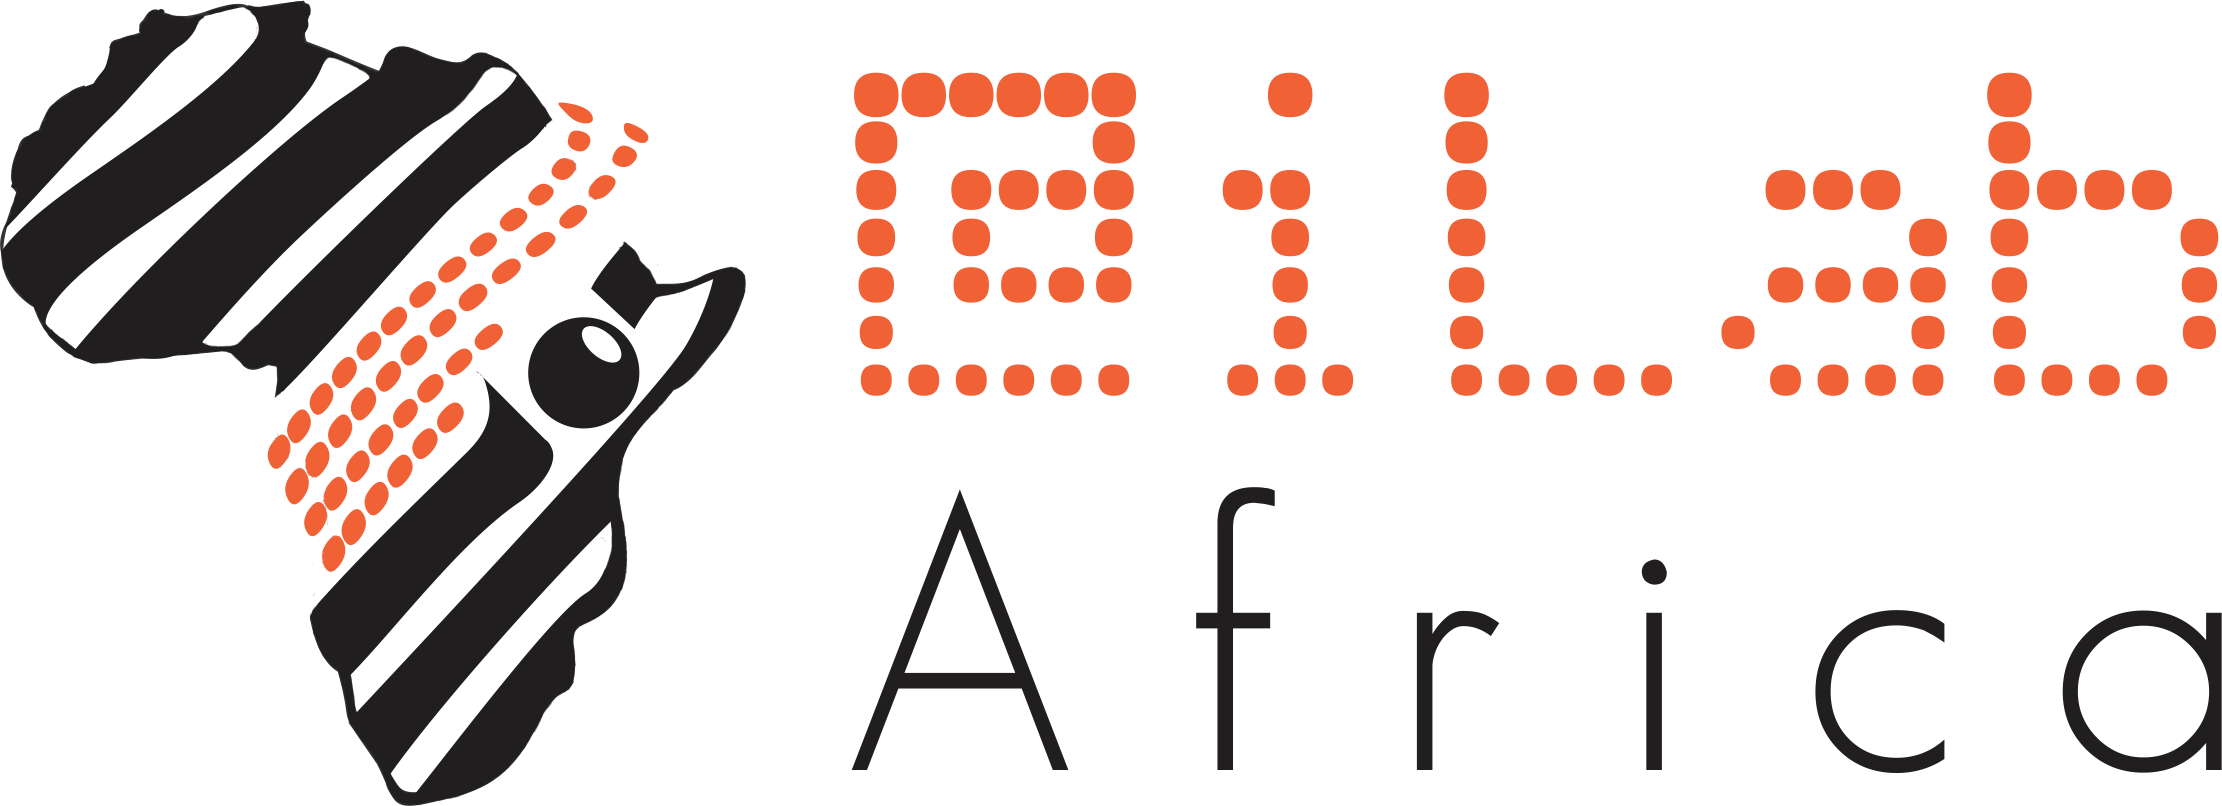 @iLabAfrica logo